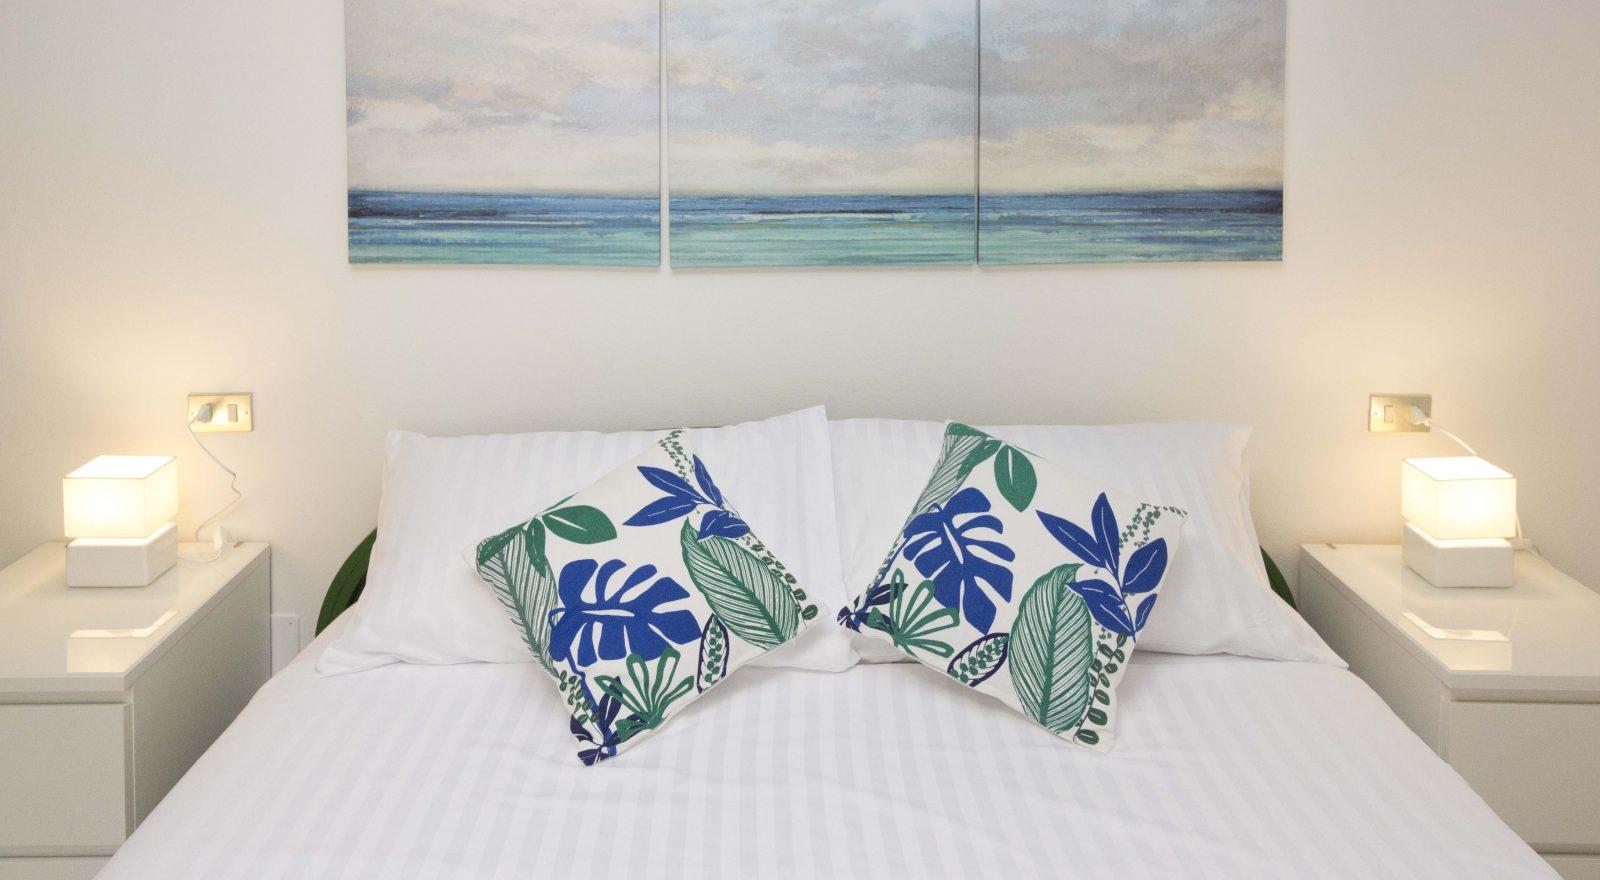 Appartamento Nicchie - Casa Vacanze Iseo Portelle Holiday - camera